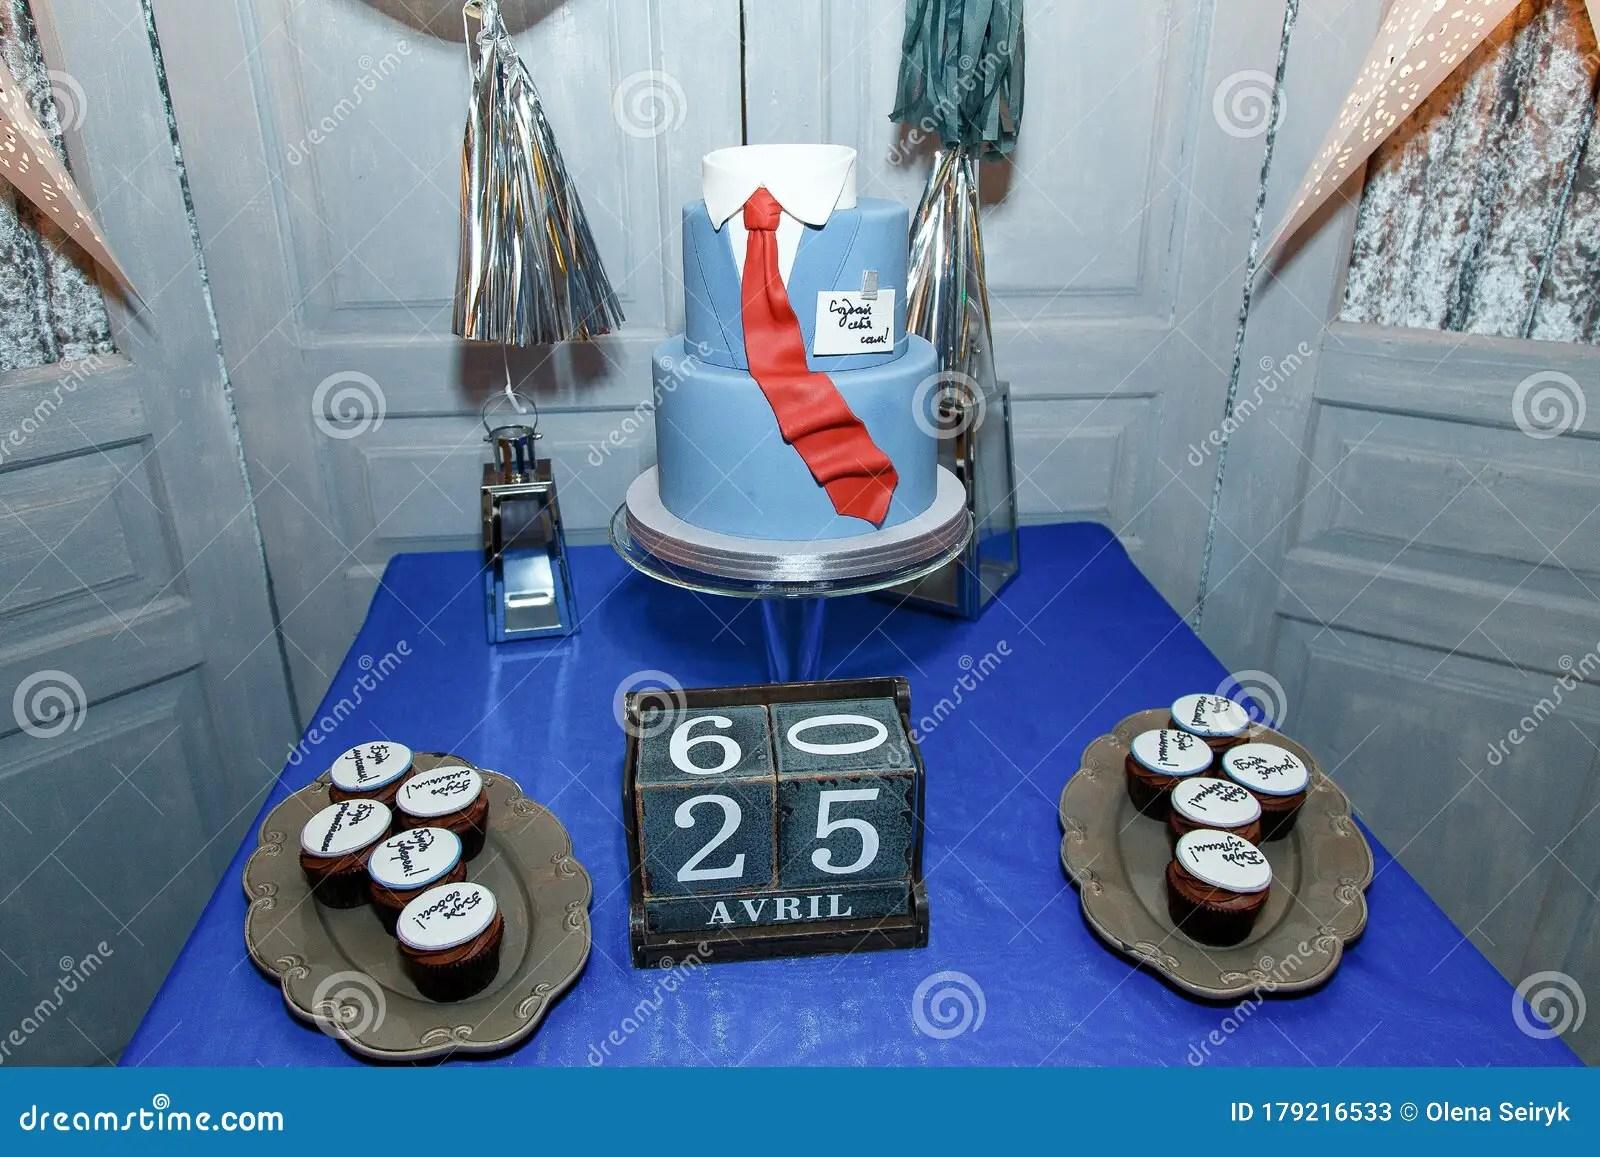 351 Teenage Boy Cake Photos Free Royalty Free Stock Photos From Dreamstime